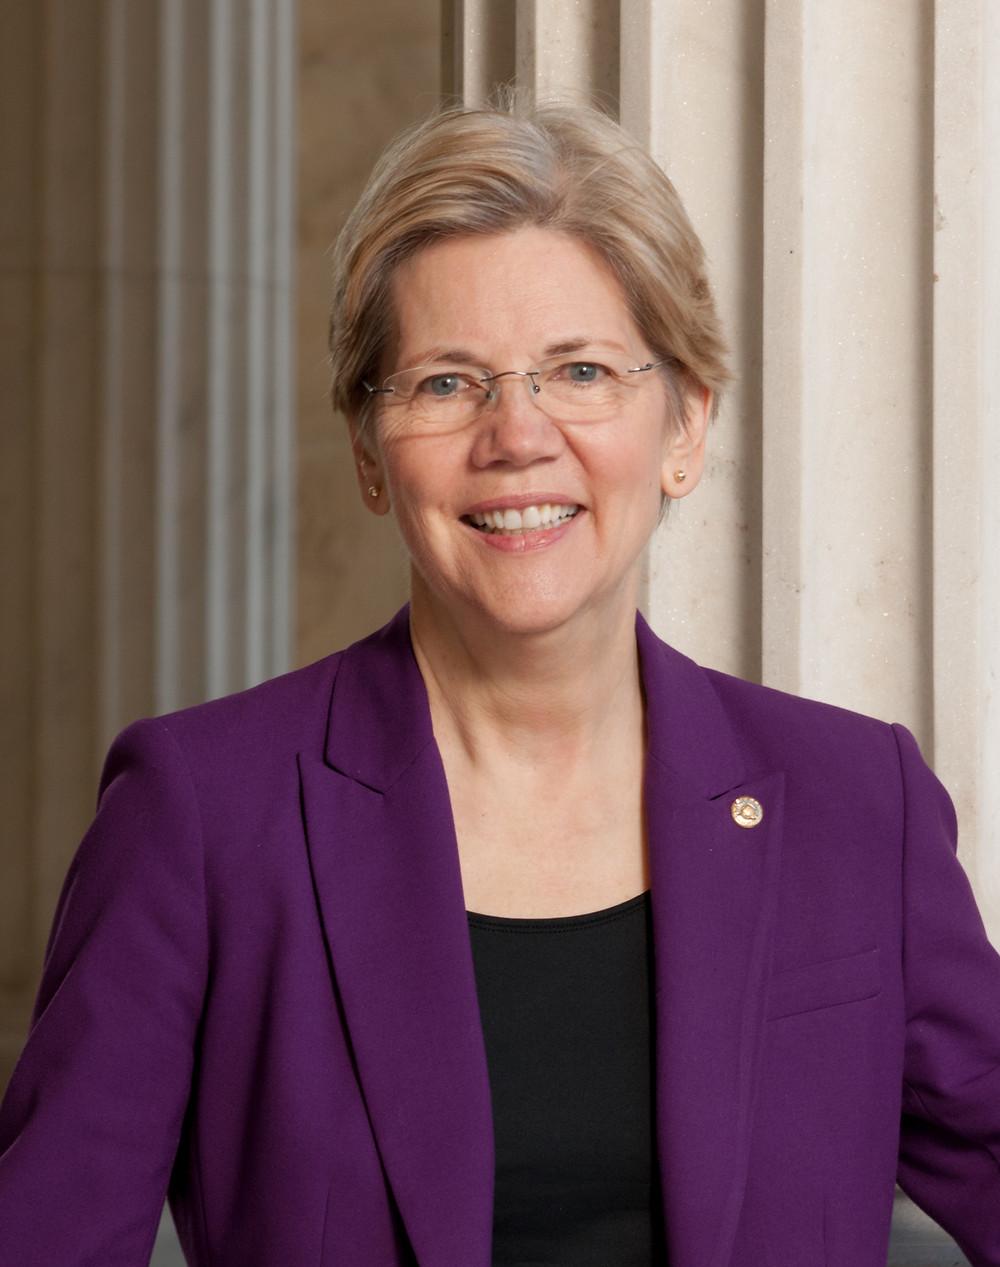 Warren official portrait